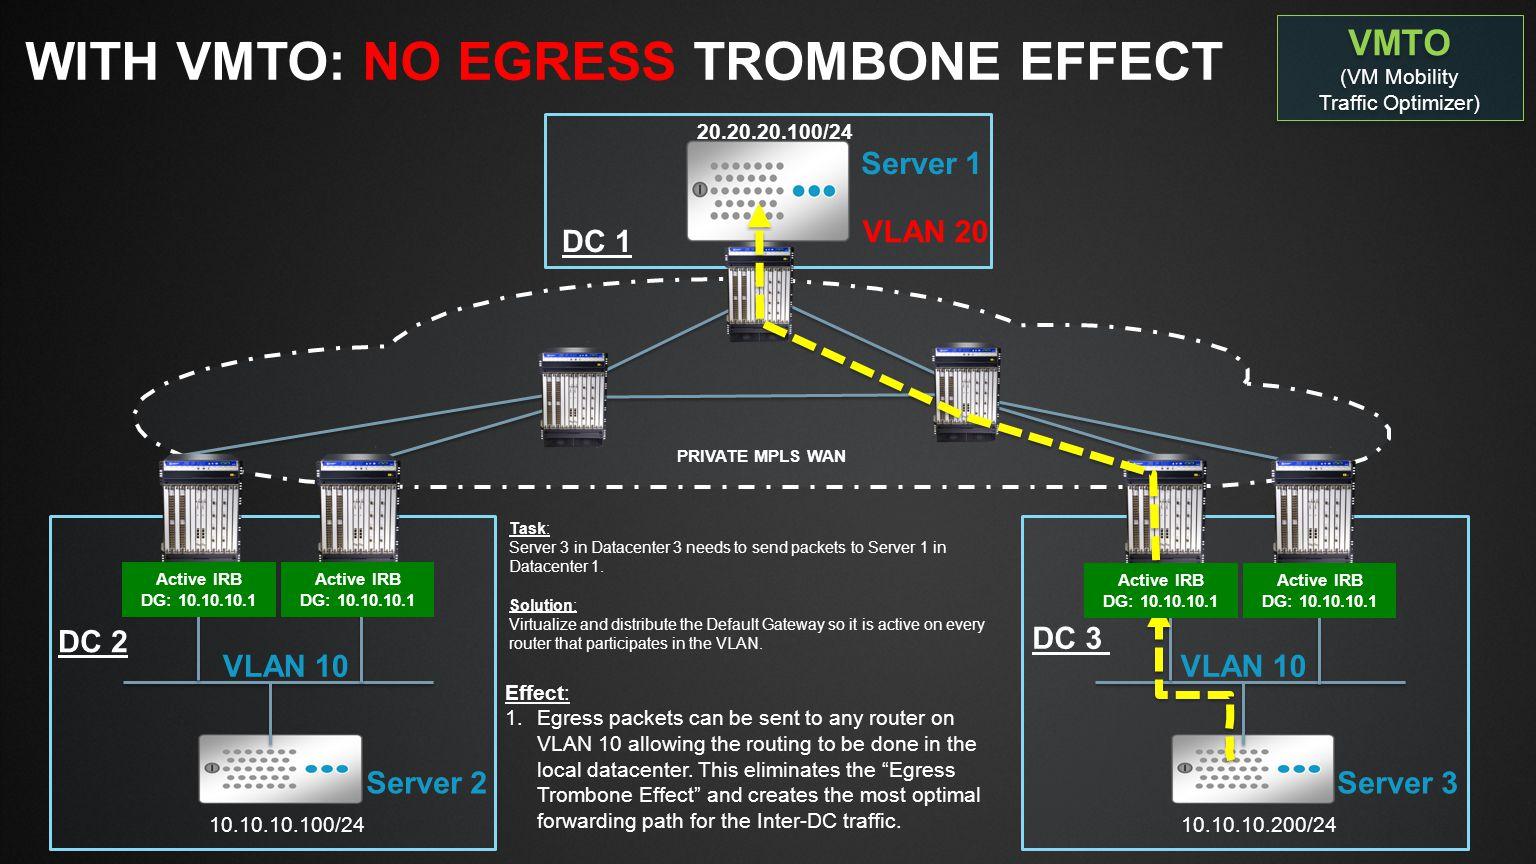 Slide Type Juniper Networks Large Venue Template / 16x9 / V6 Blank SlideTitle and Content 1-Line DC 2 VLAN 10 10.10.10.100/24 DC 3 10.10.10.200/24 VLAN 10 VLAN 20 Server 2Server 3 Server 1 PRIVATE MPLS WAN DC 1 20.20.20.100/24 WITHOUT VMTO: INGRESS TROMBONE EFFECT Task: Server 1 in Datacenter 1 needs to send packets to Server 3 in Datacenter 3.